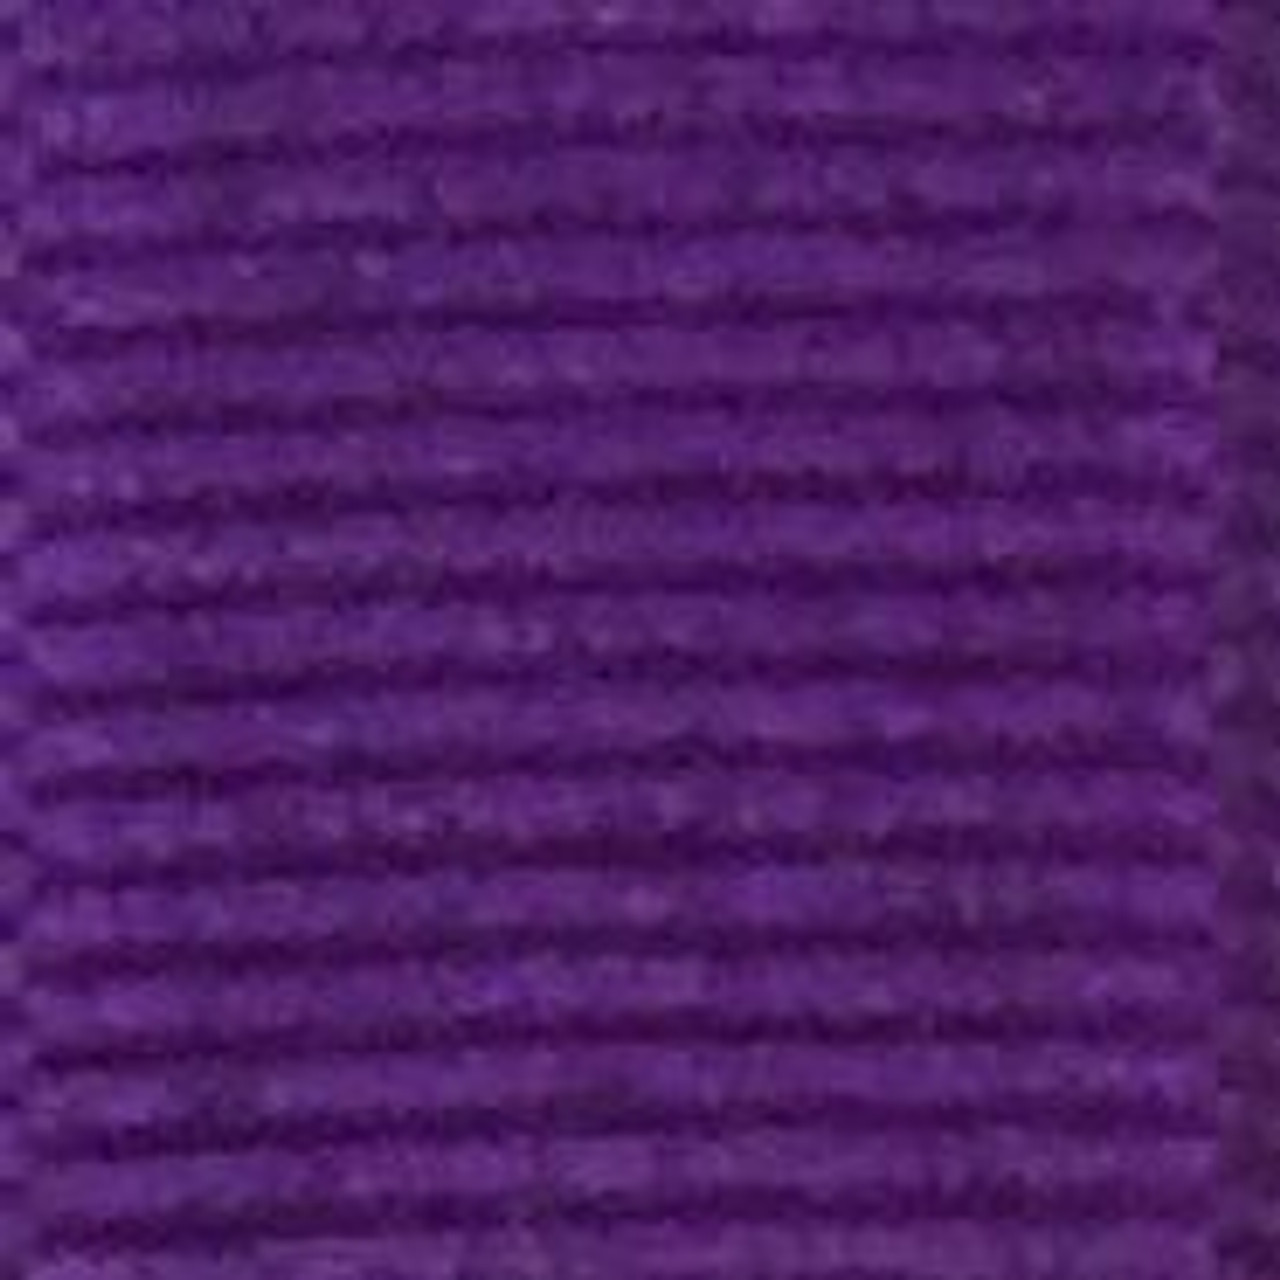 Purple Solid Grosgrain Ribbon